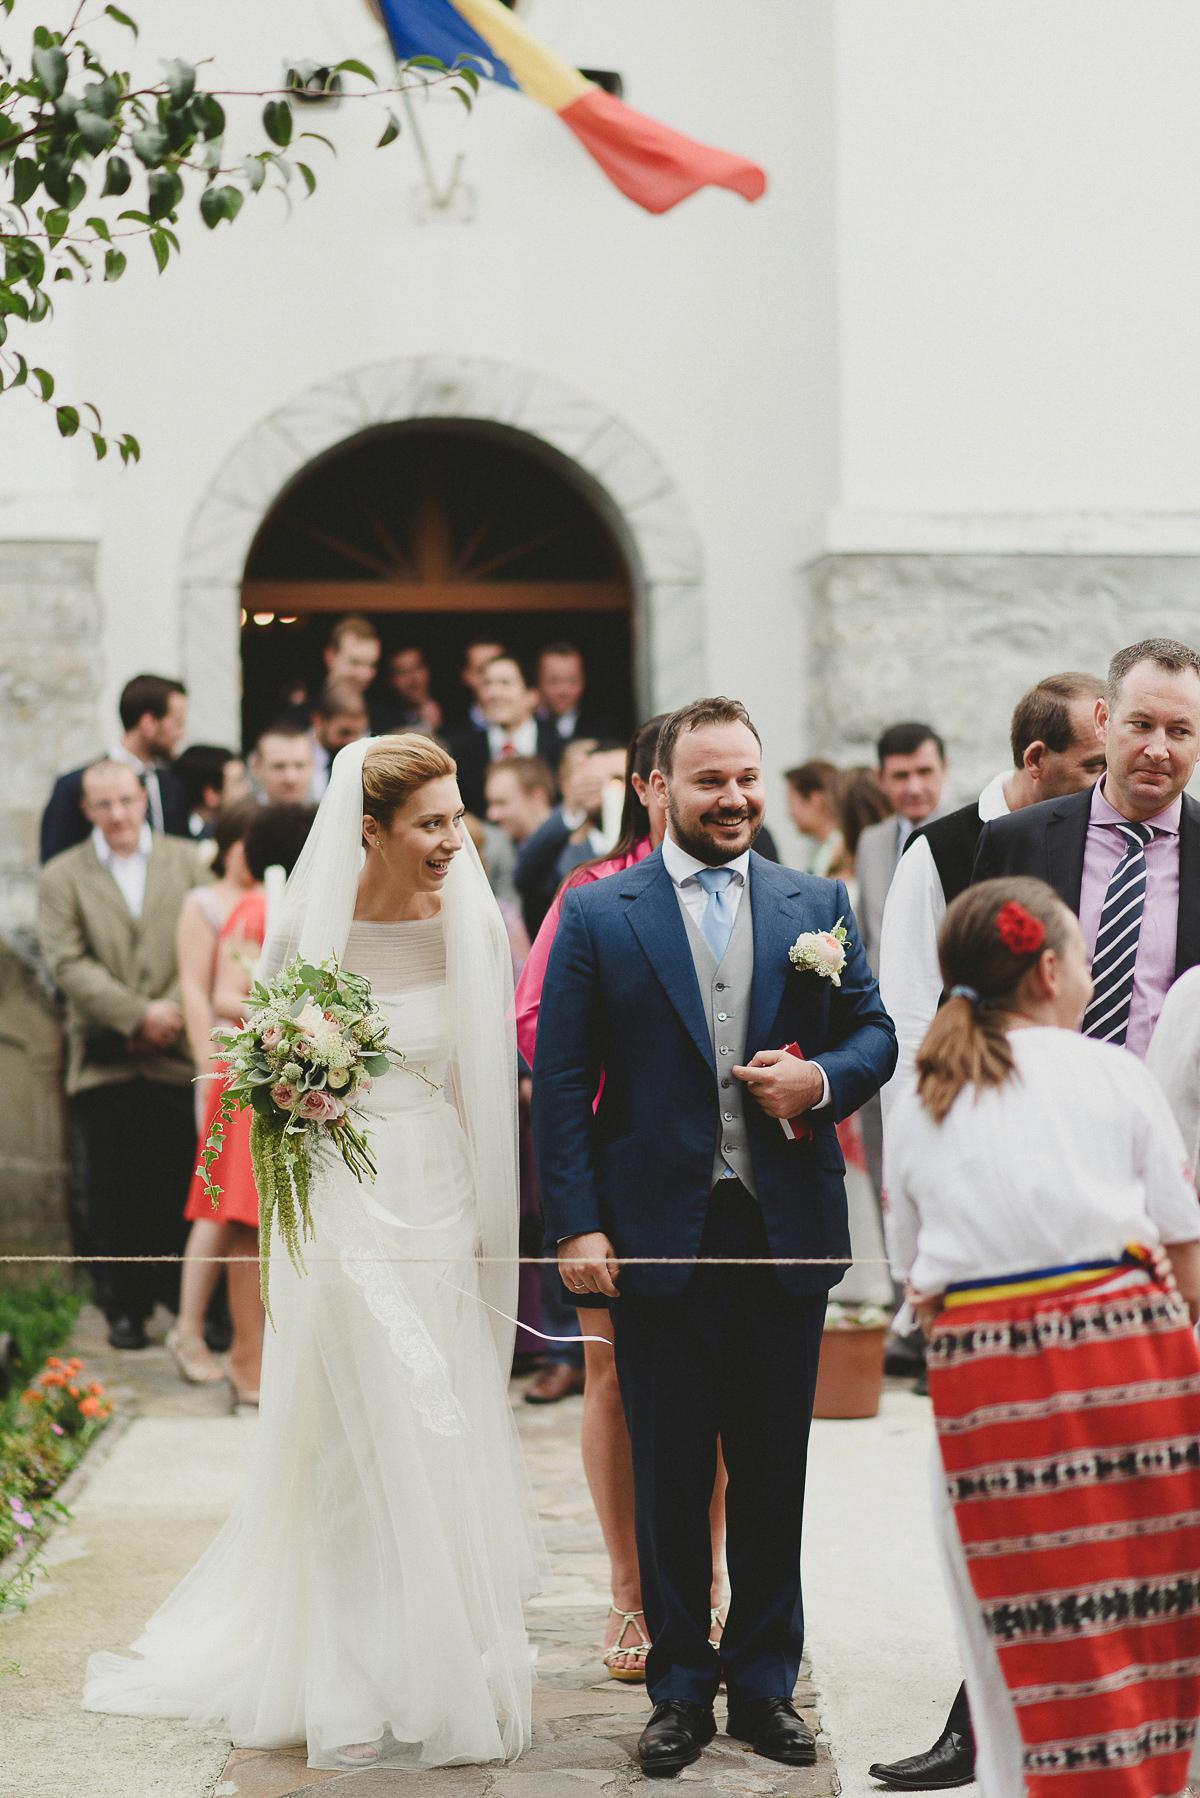 Pronovias elegance for an intimate summer wedding in romania love my dress uk wedding blog - Traditional style wedding romania ...